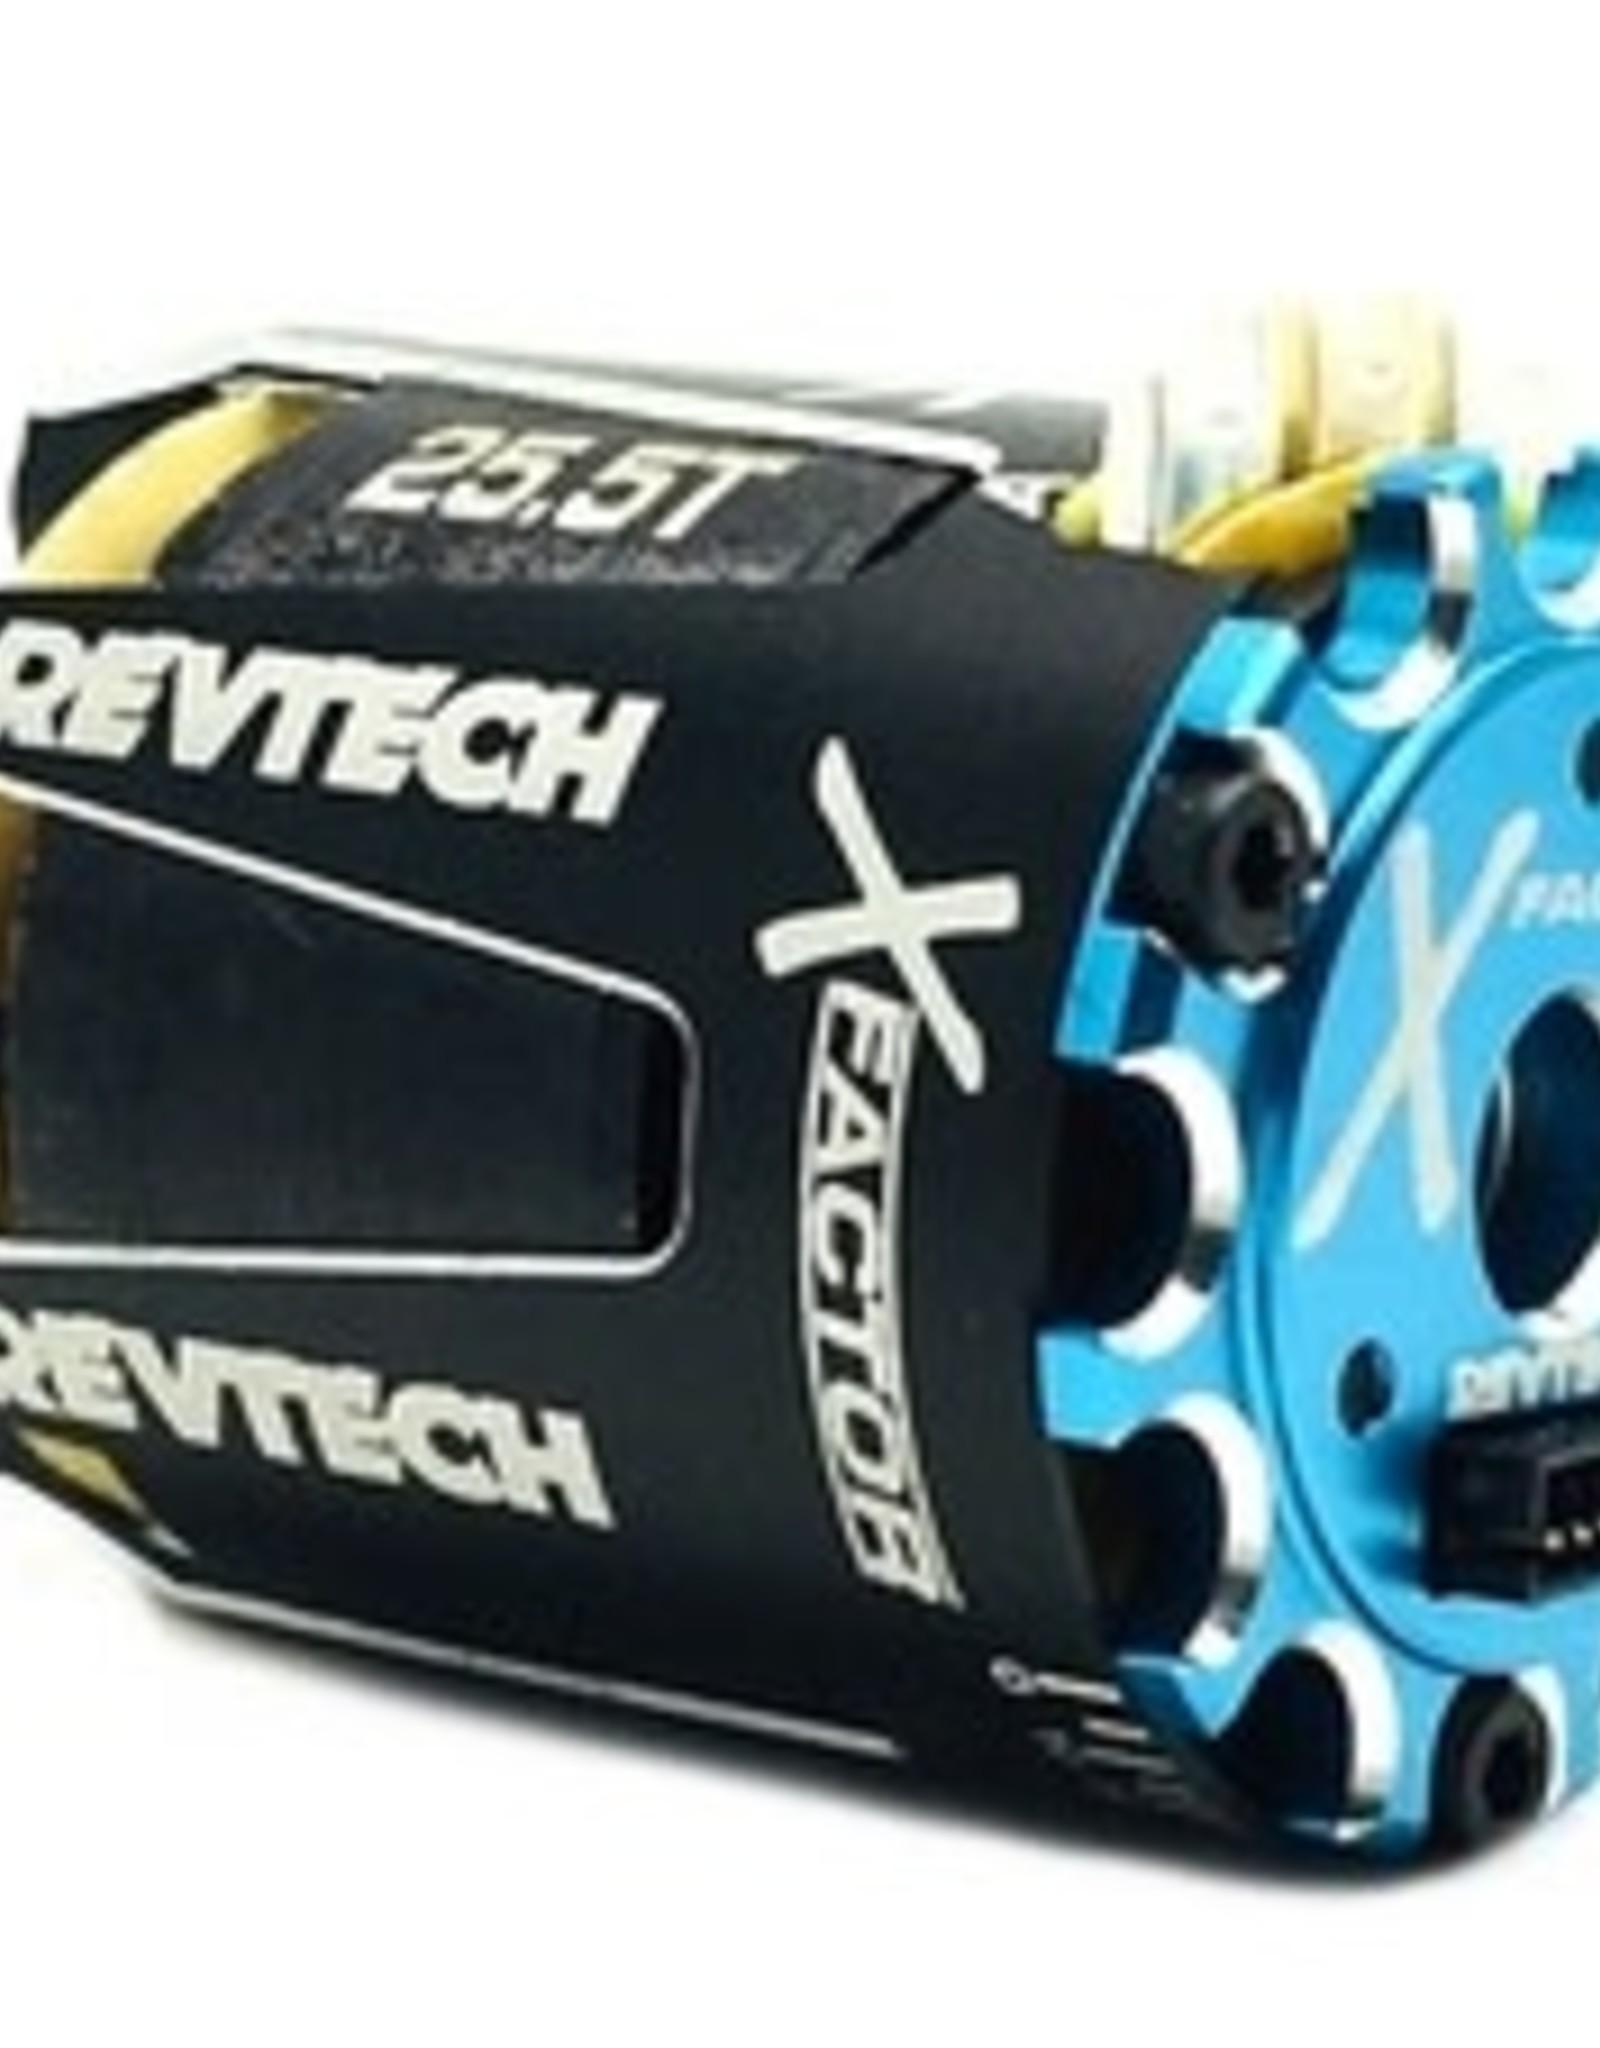 Trinity X-Factor 25.5 Turn Spec Class Brushless Motor